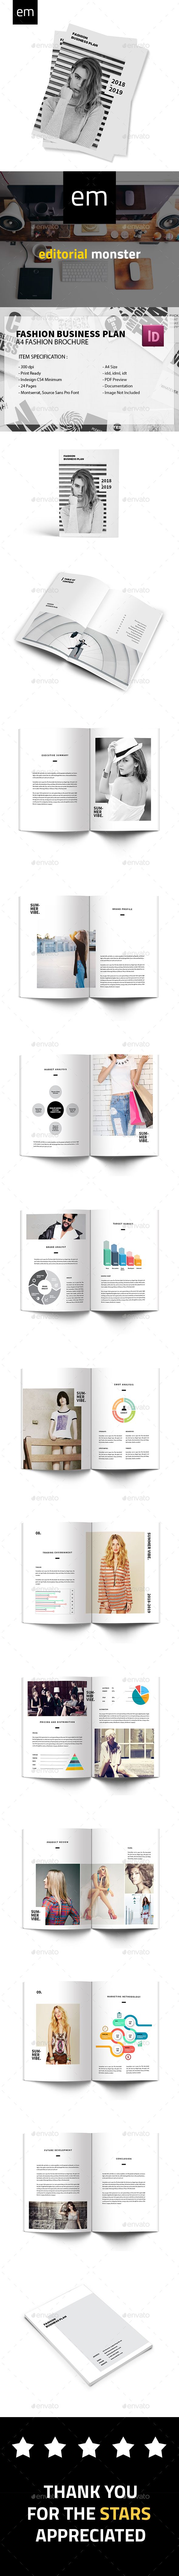 Fashion Business Plan | Folletos